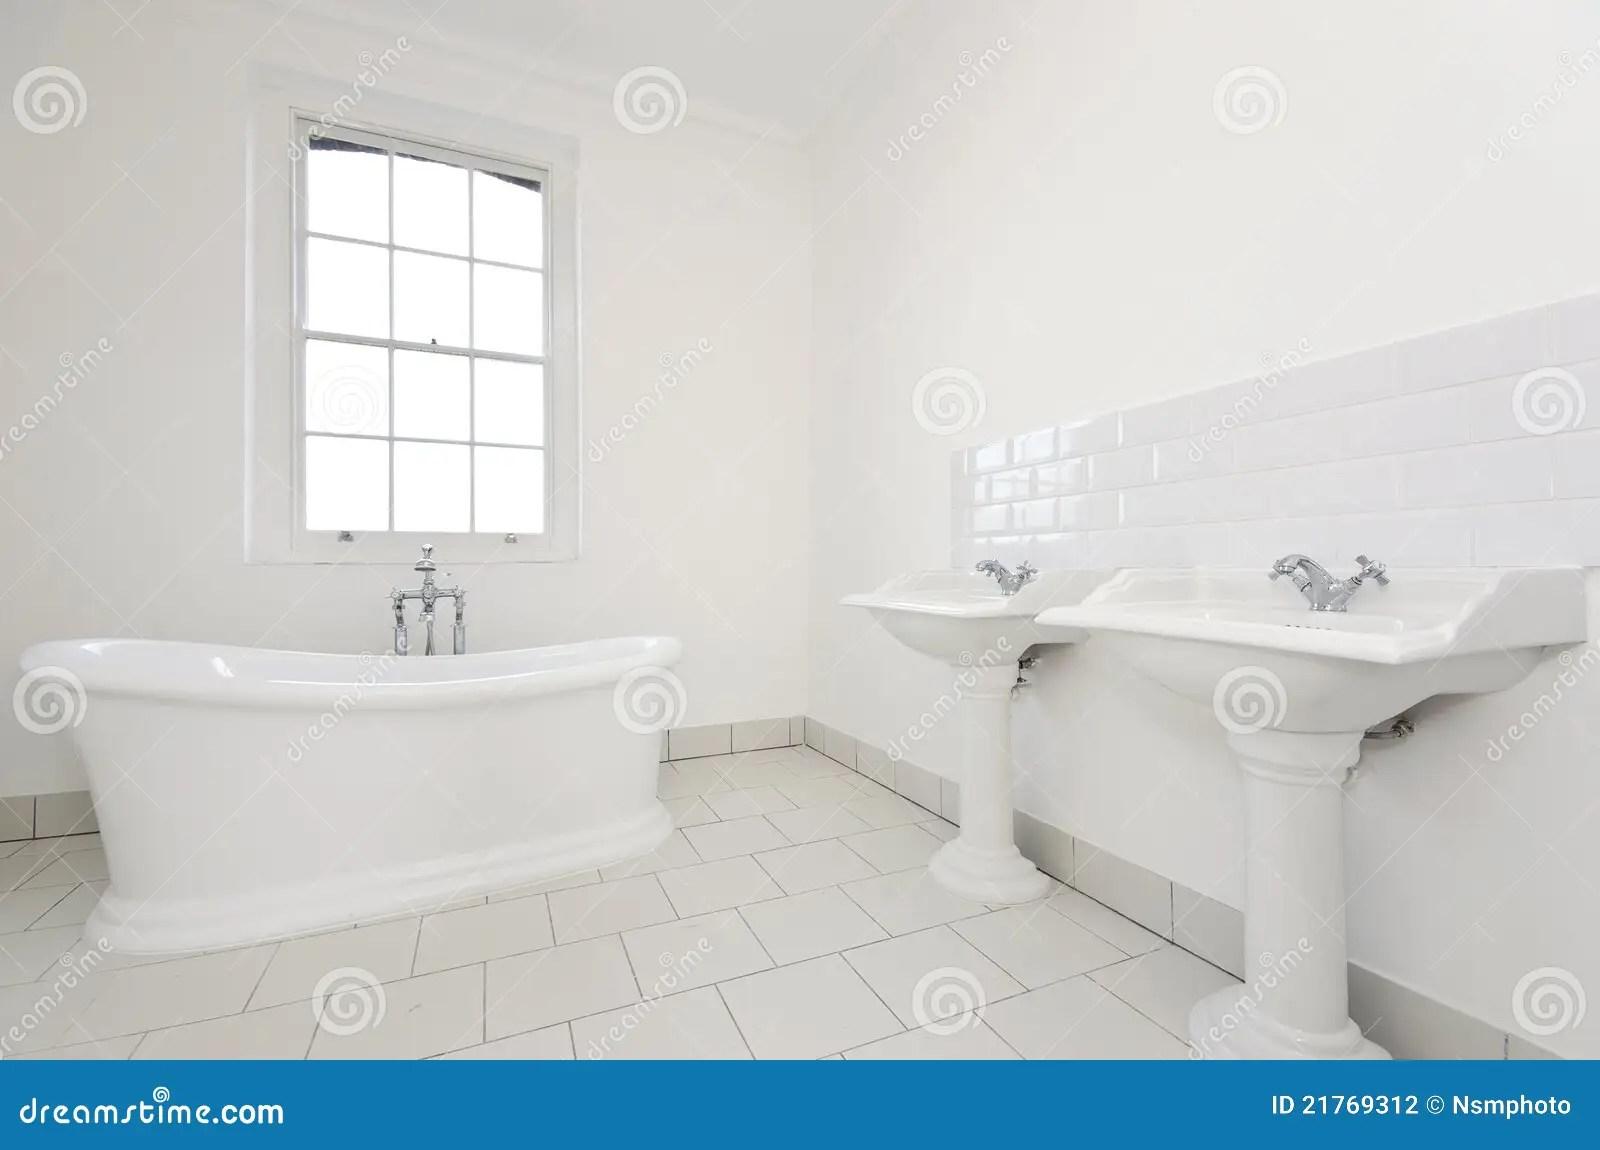 Classy Family Bathroom With Free Standing Bathtub Stock